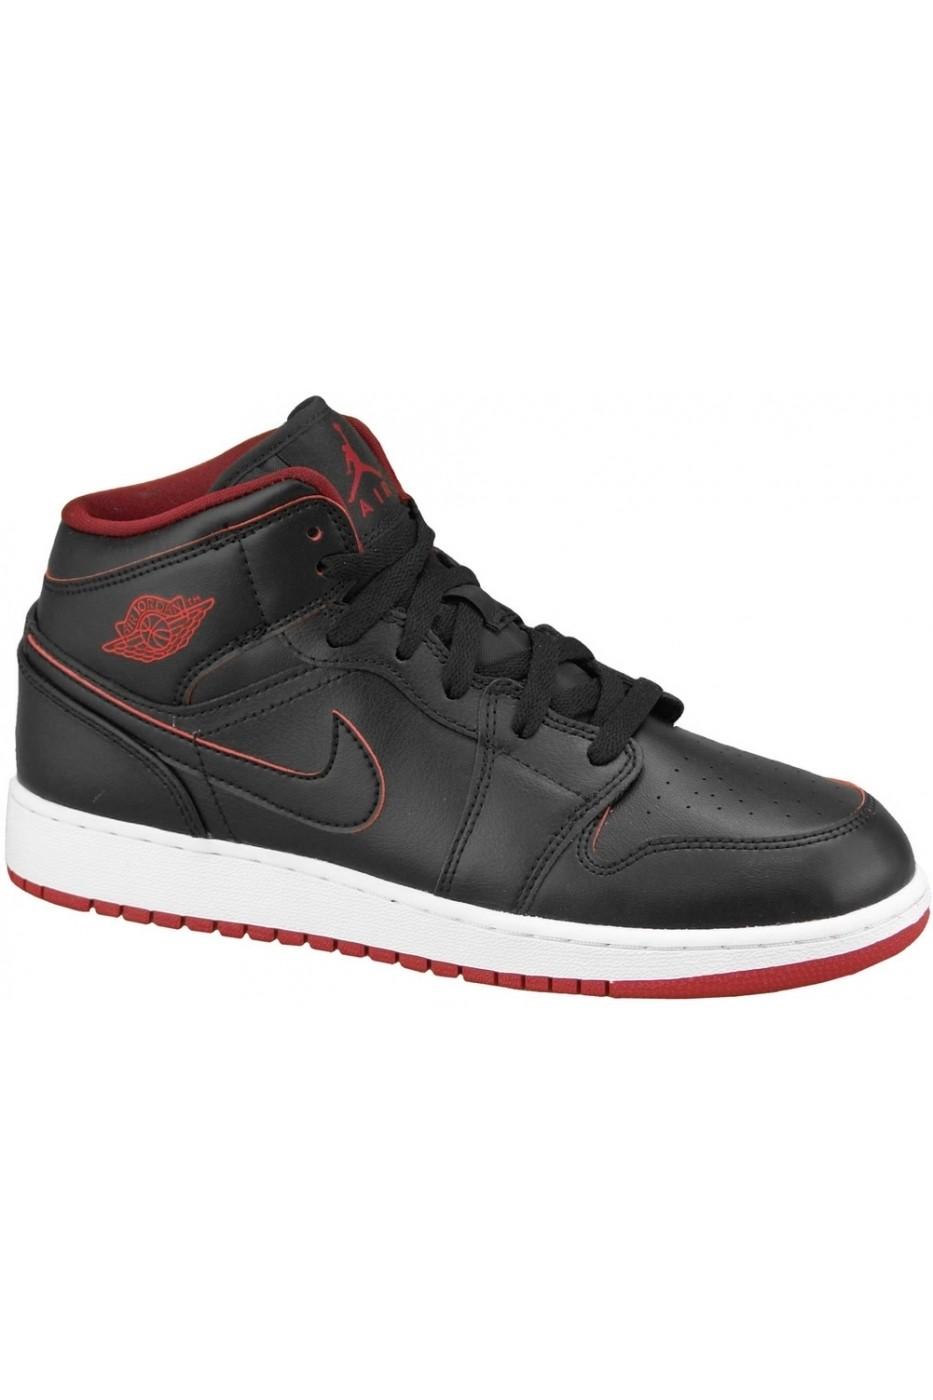 9b0a5355de94fe Pantofi sport pentru barbati Nike Air Jordan 1 Mid - FashionUP!